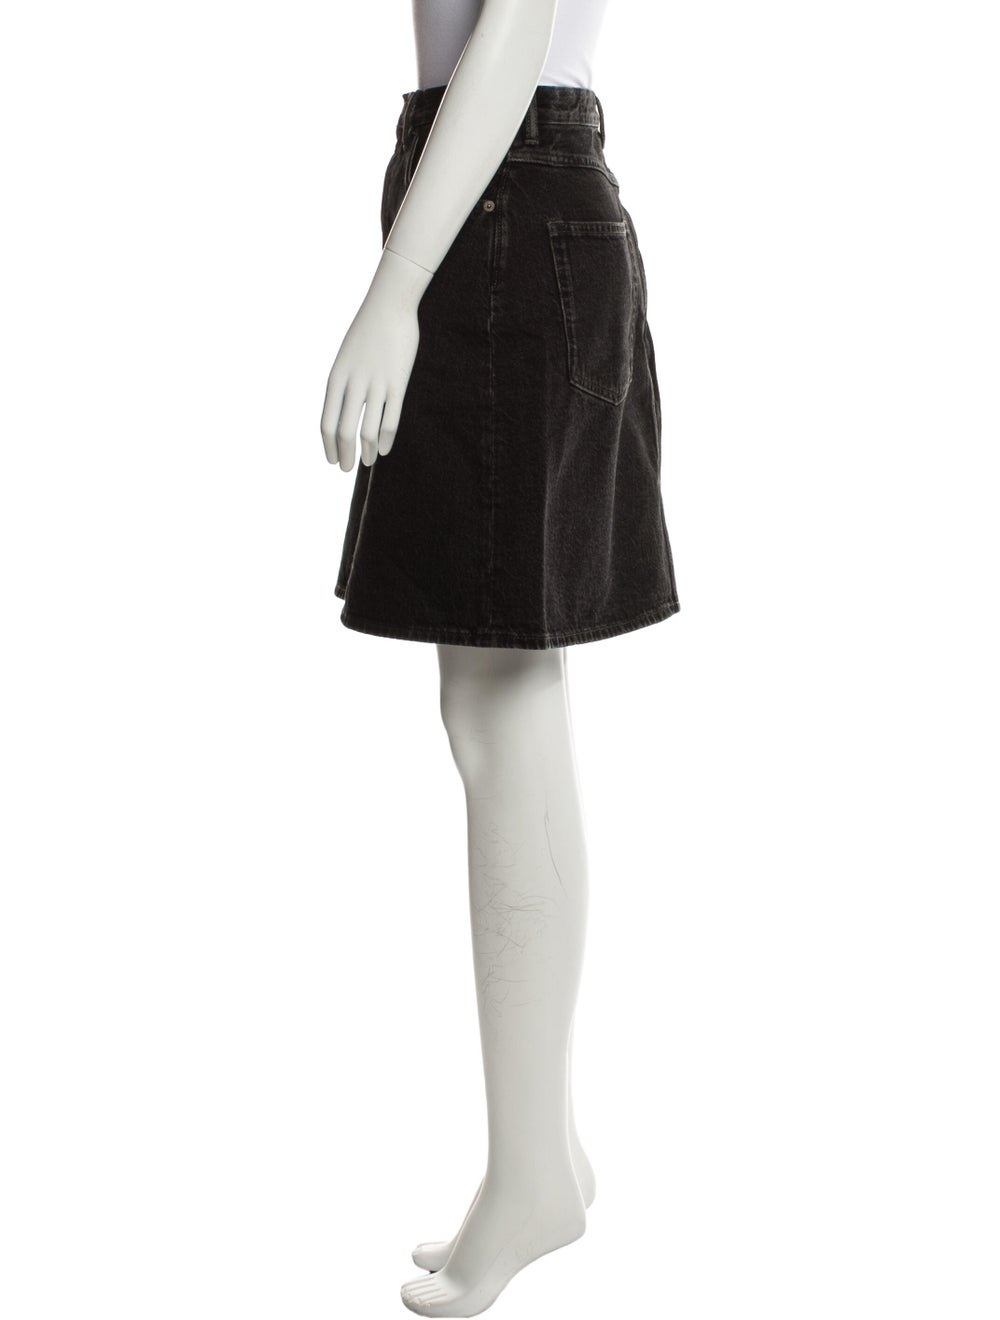 Acne Studios Mini Skirt Black - image 2